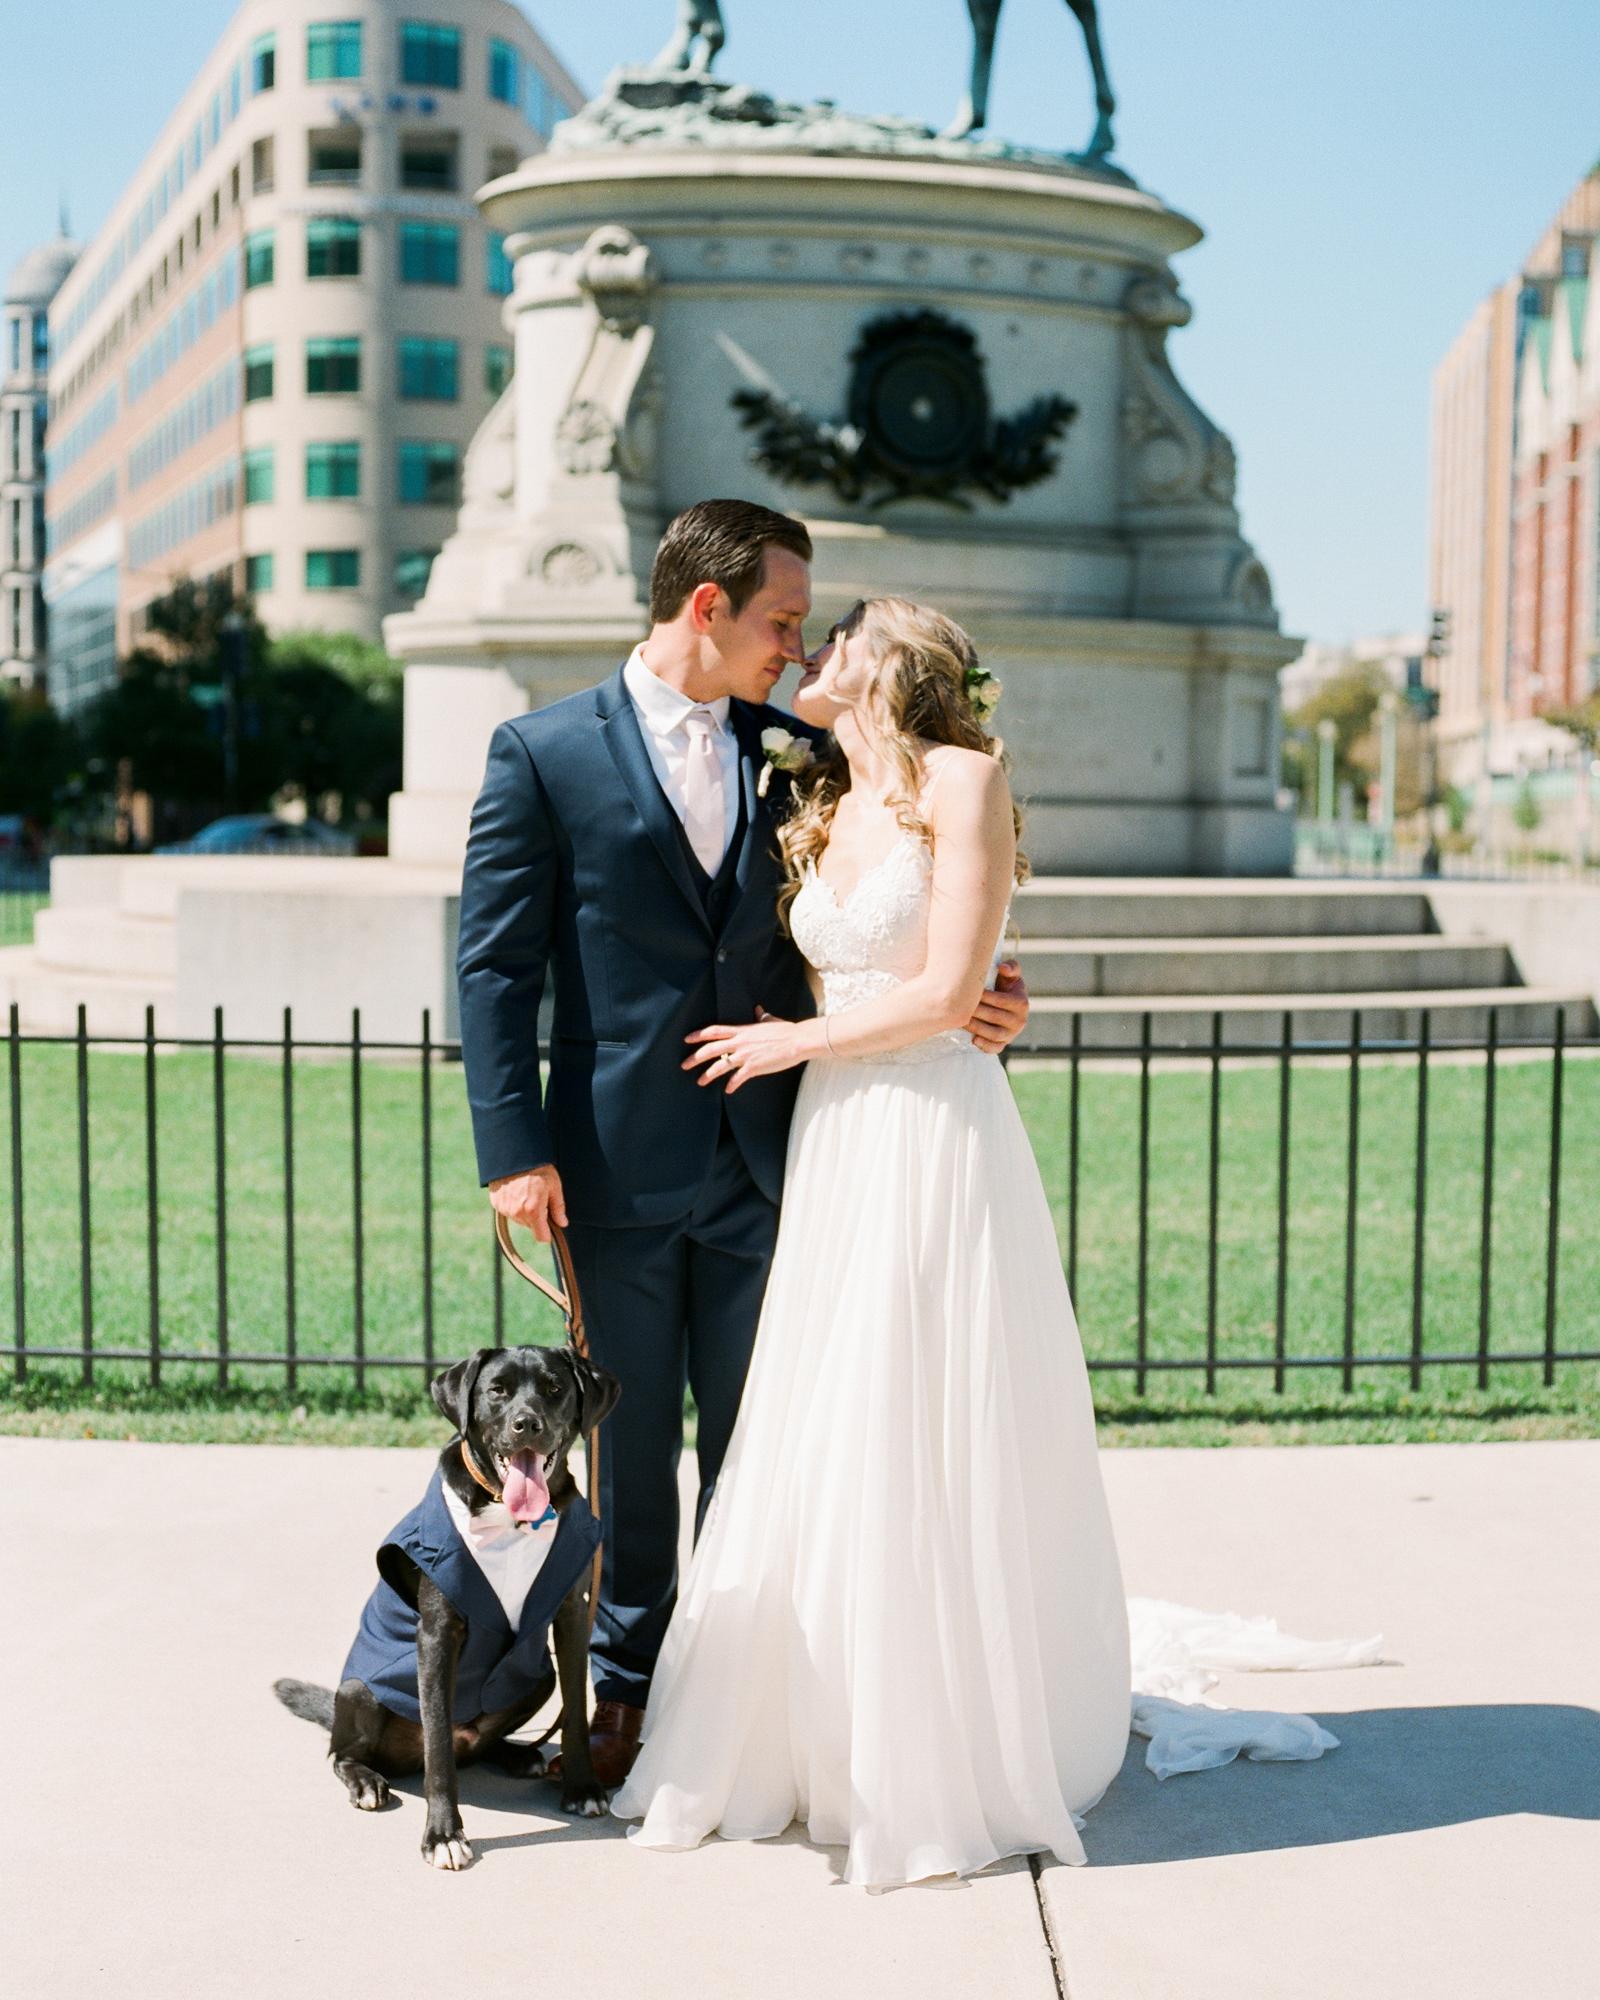 LongView-Gallery-Wedding-Art-Washington-DC-Film-Photographer-8.jpg